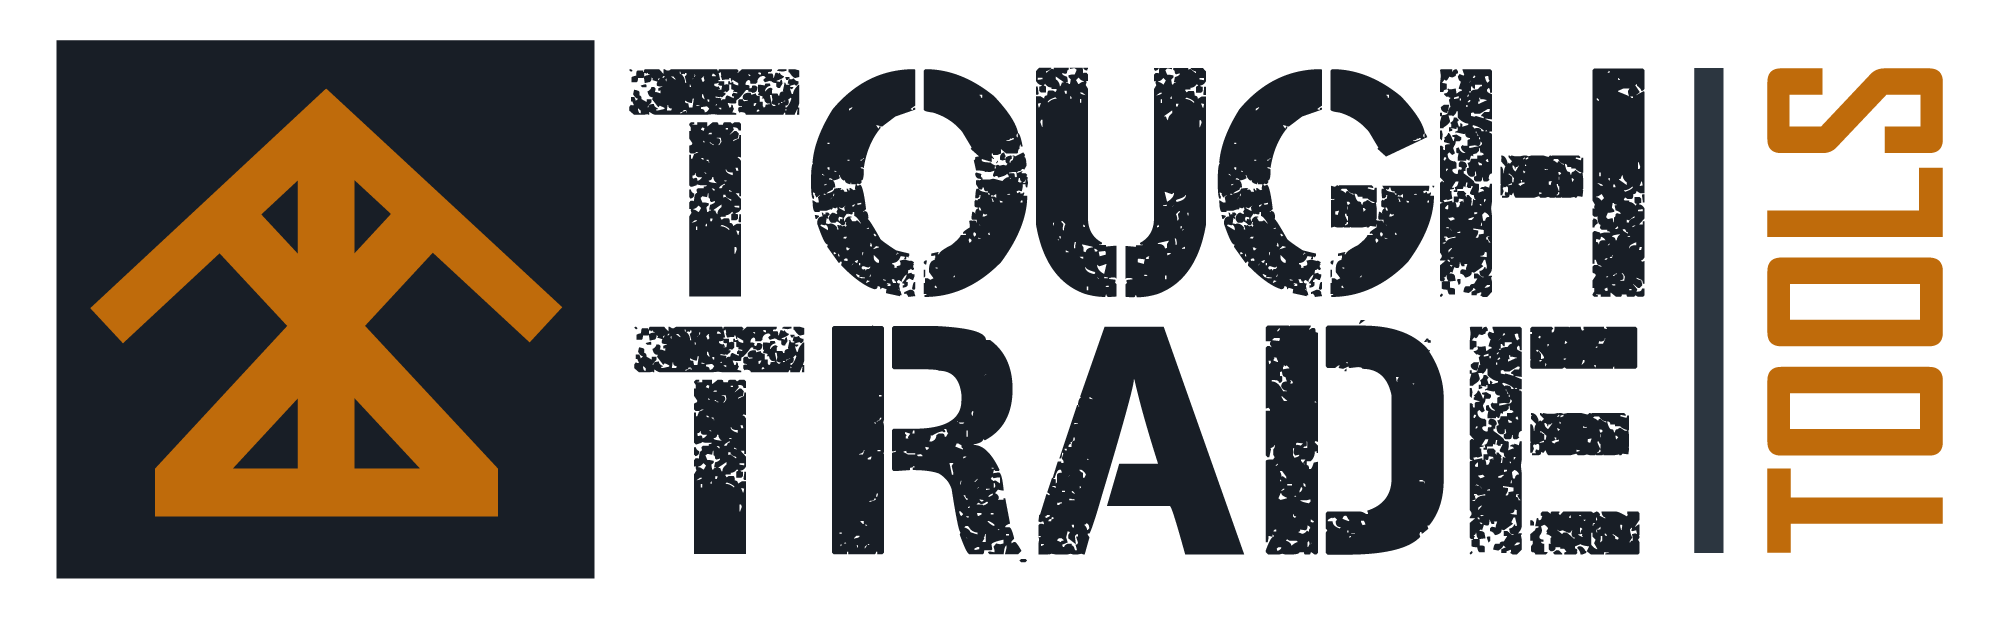 Tough Trade Tools